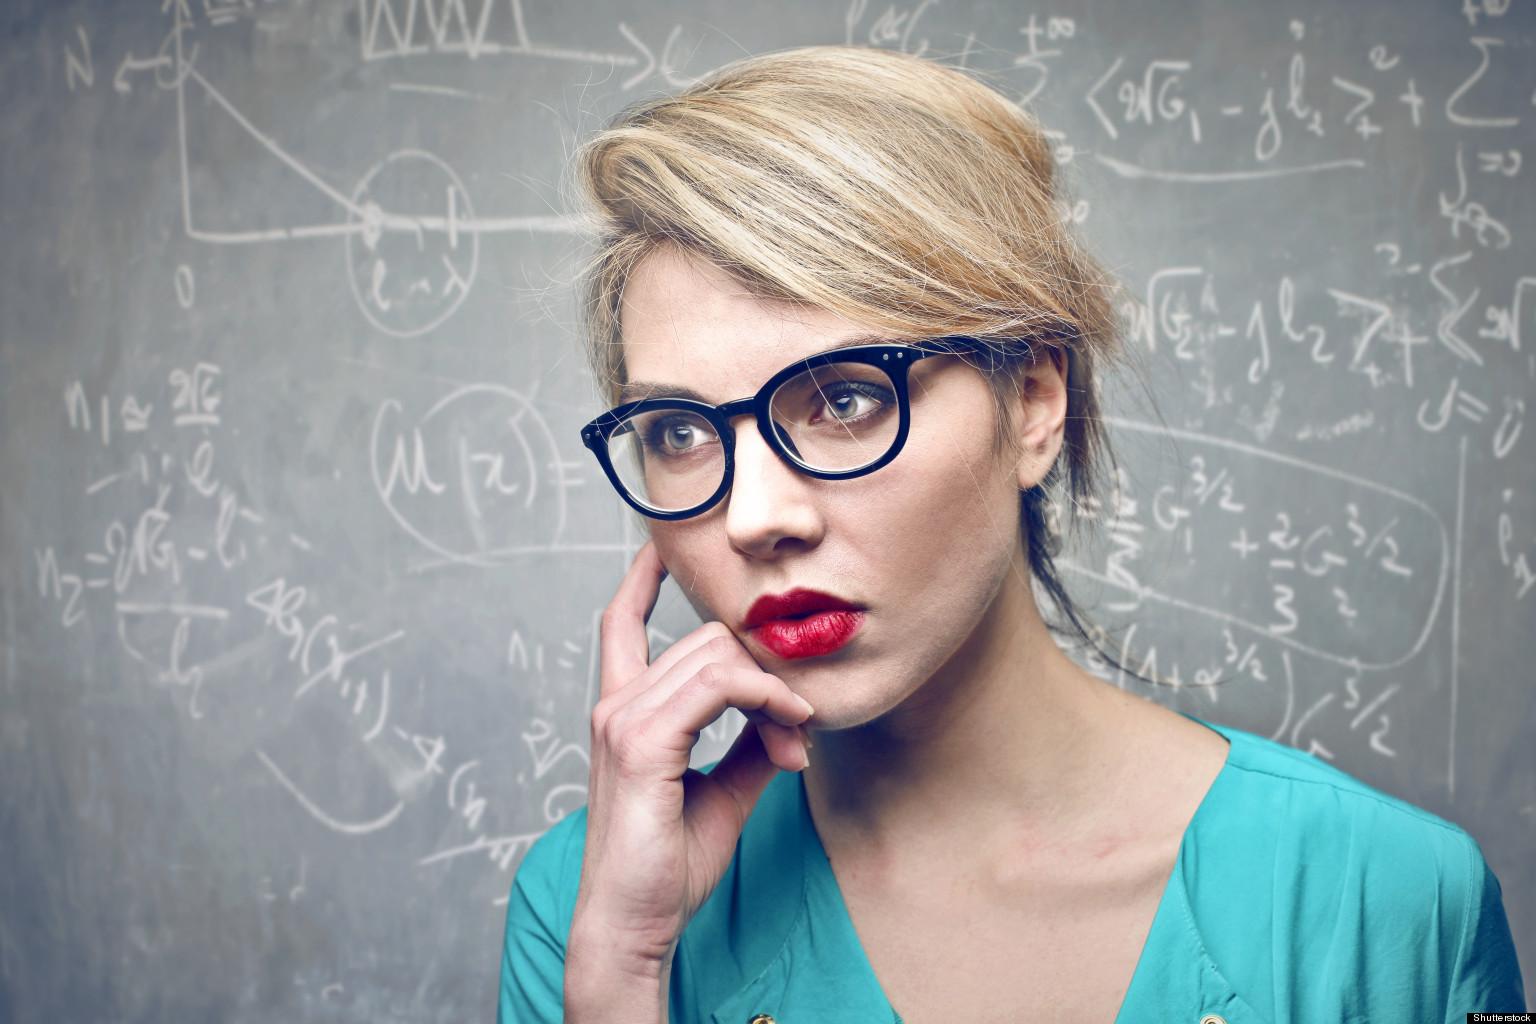 Why smart people don't make sense